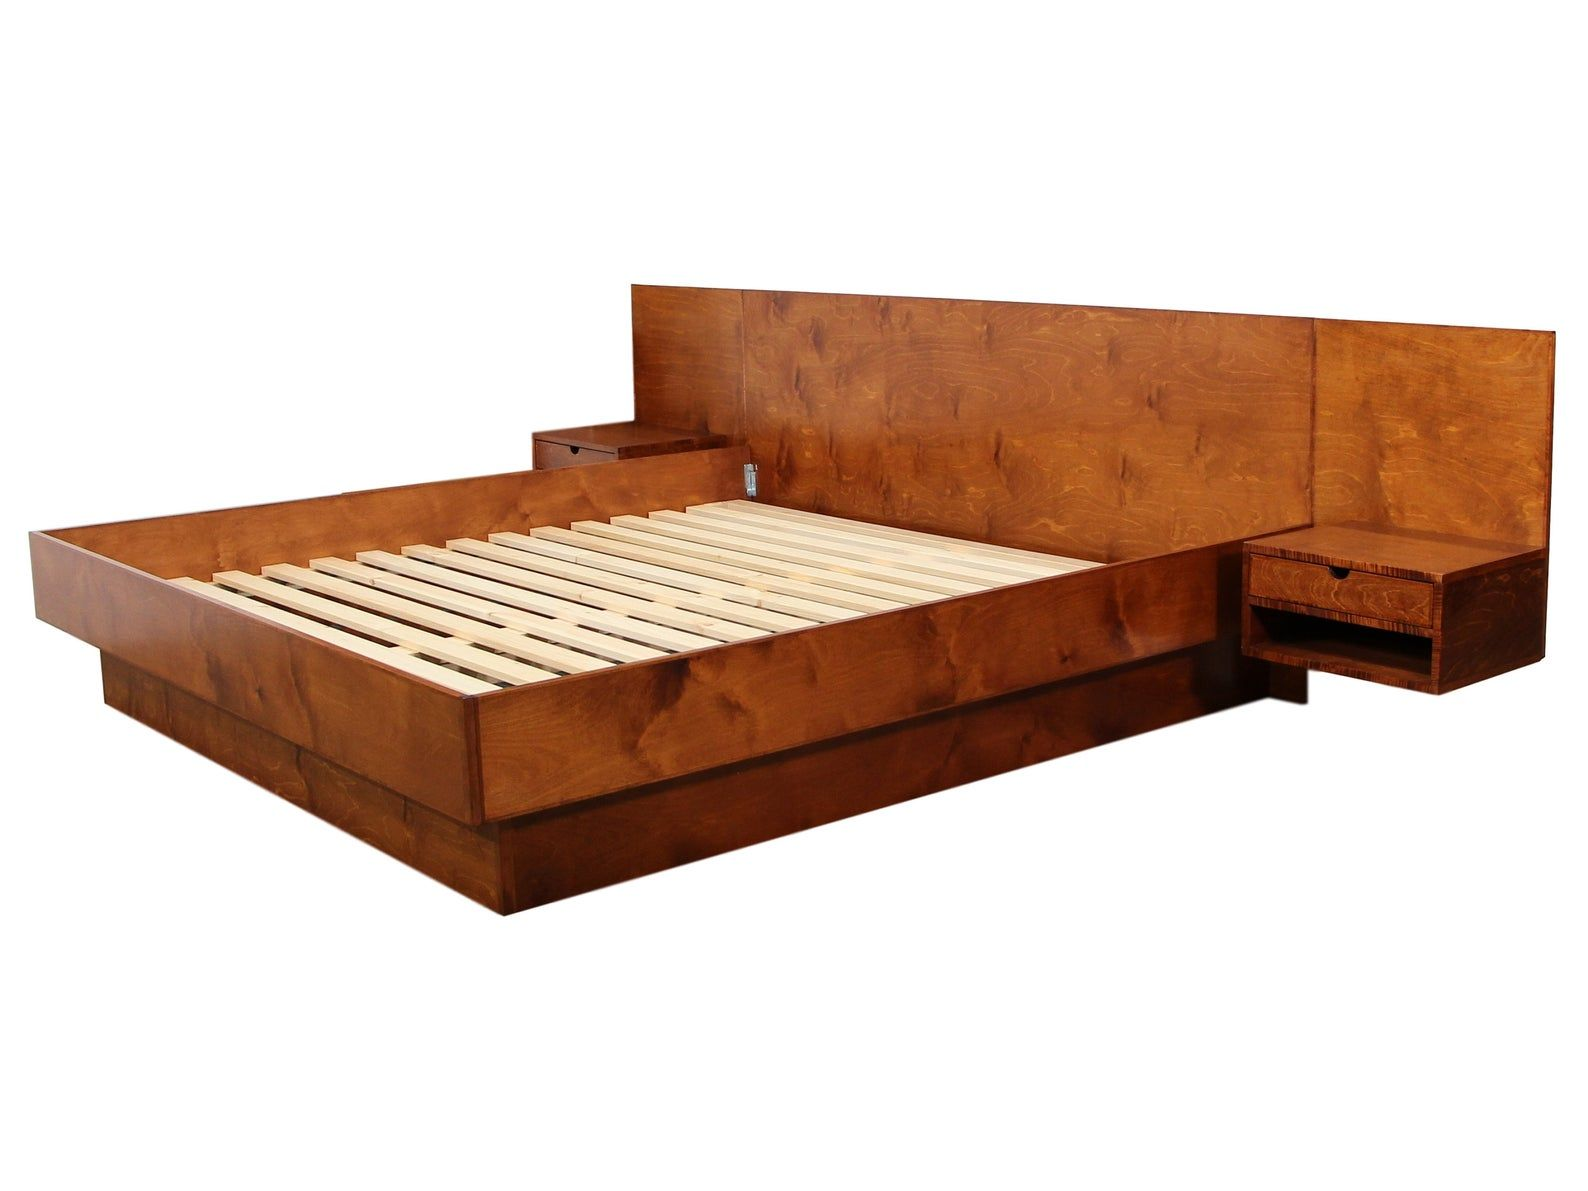 New Danish Inspired Custom King Size Platform Bed Etsy